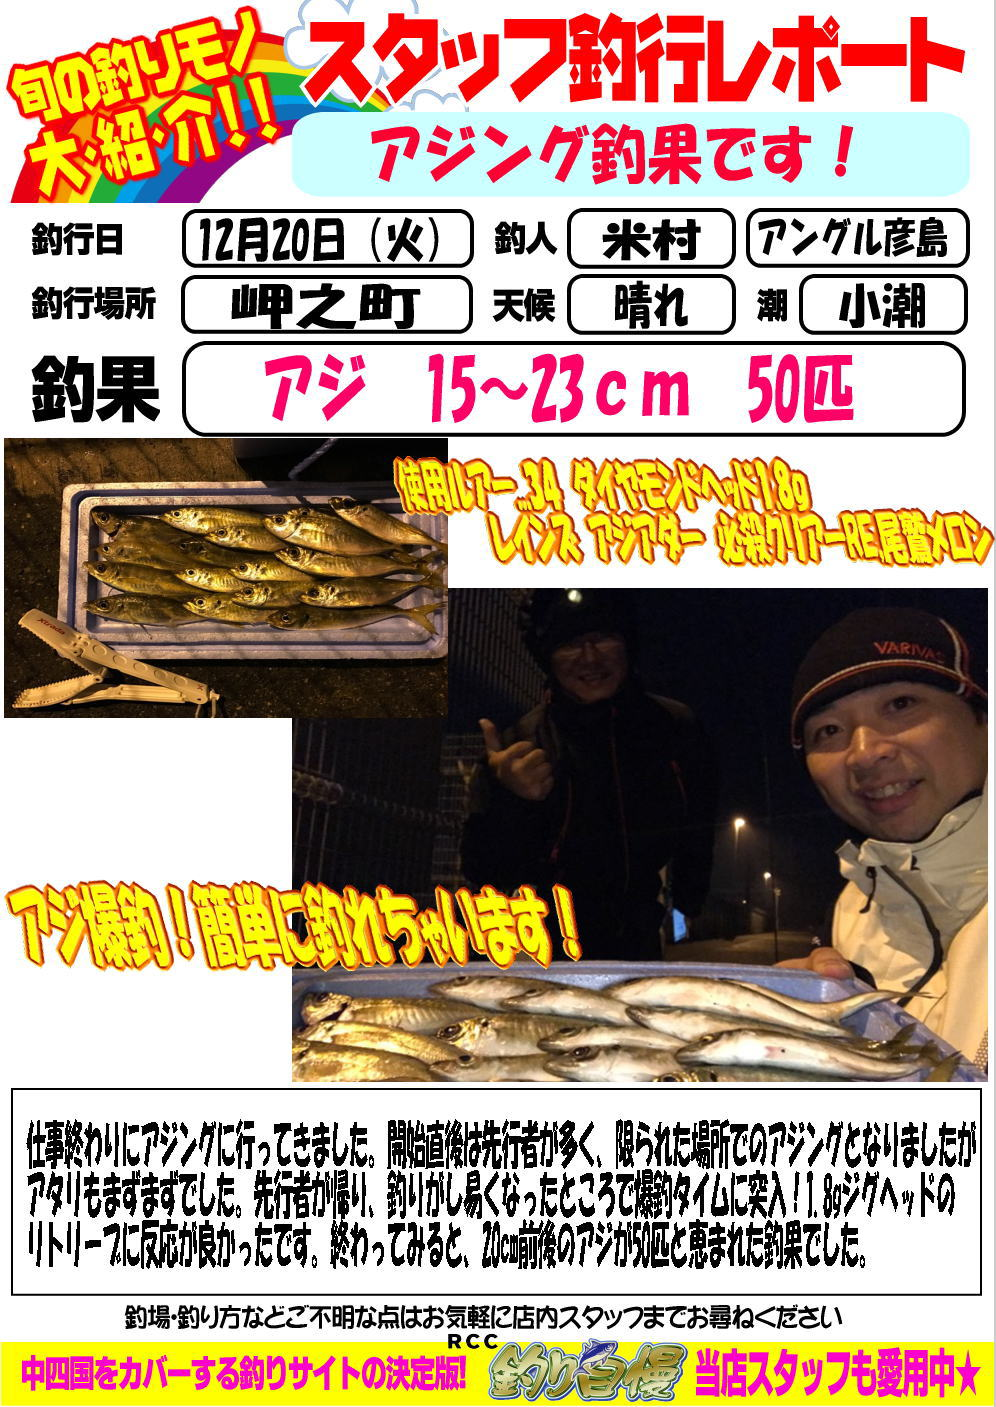 http://www.e-angle.co.jp/shop/blog/blog-20161220-hikoshima-aji.jpg